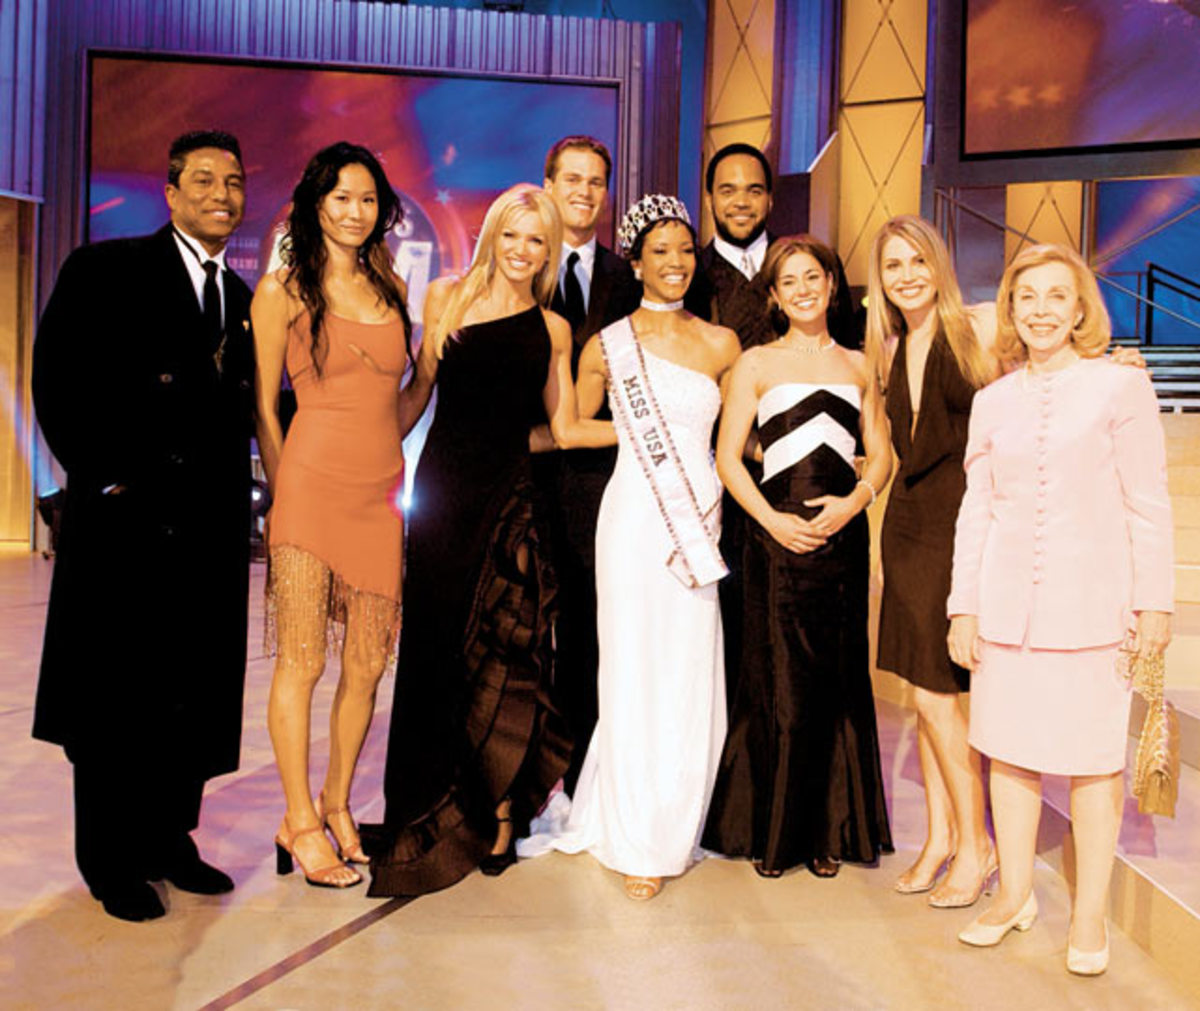 Tom Brady and Miss USA contestants